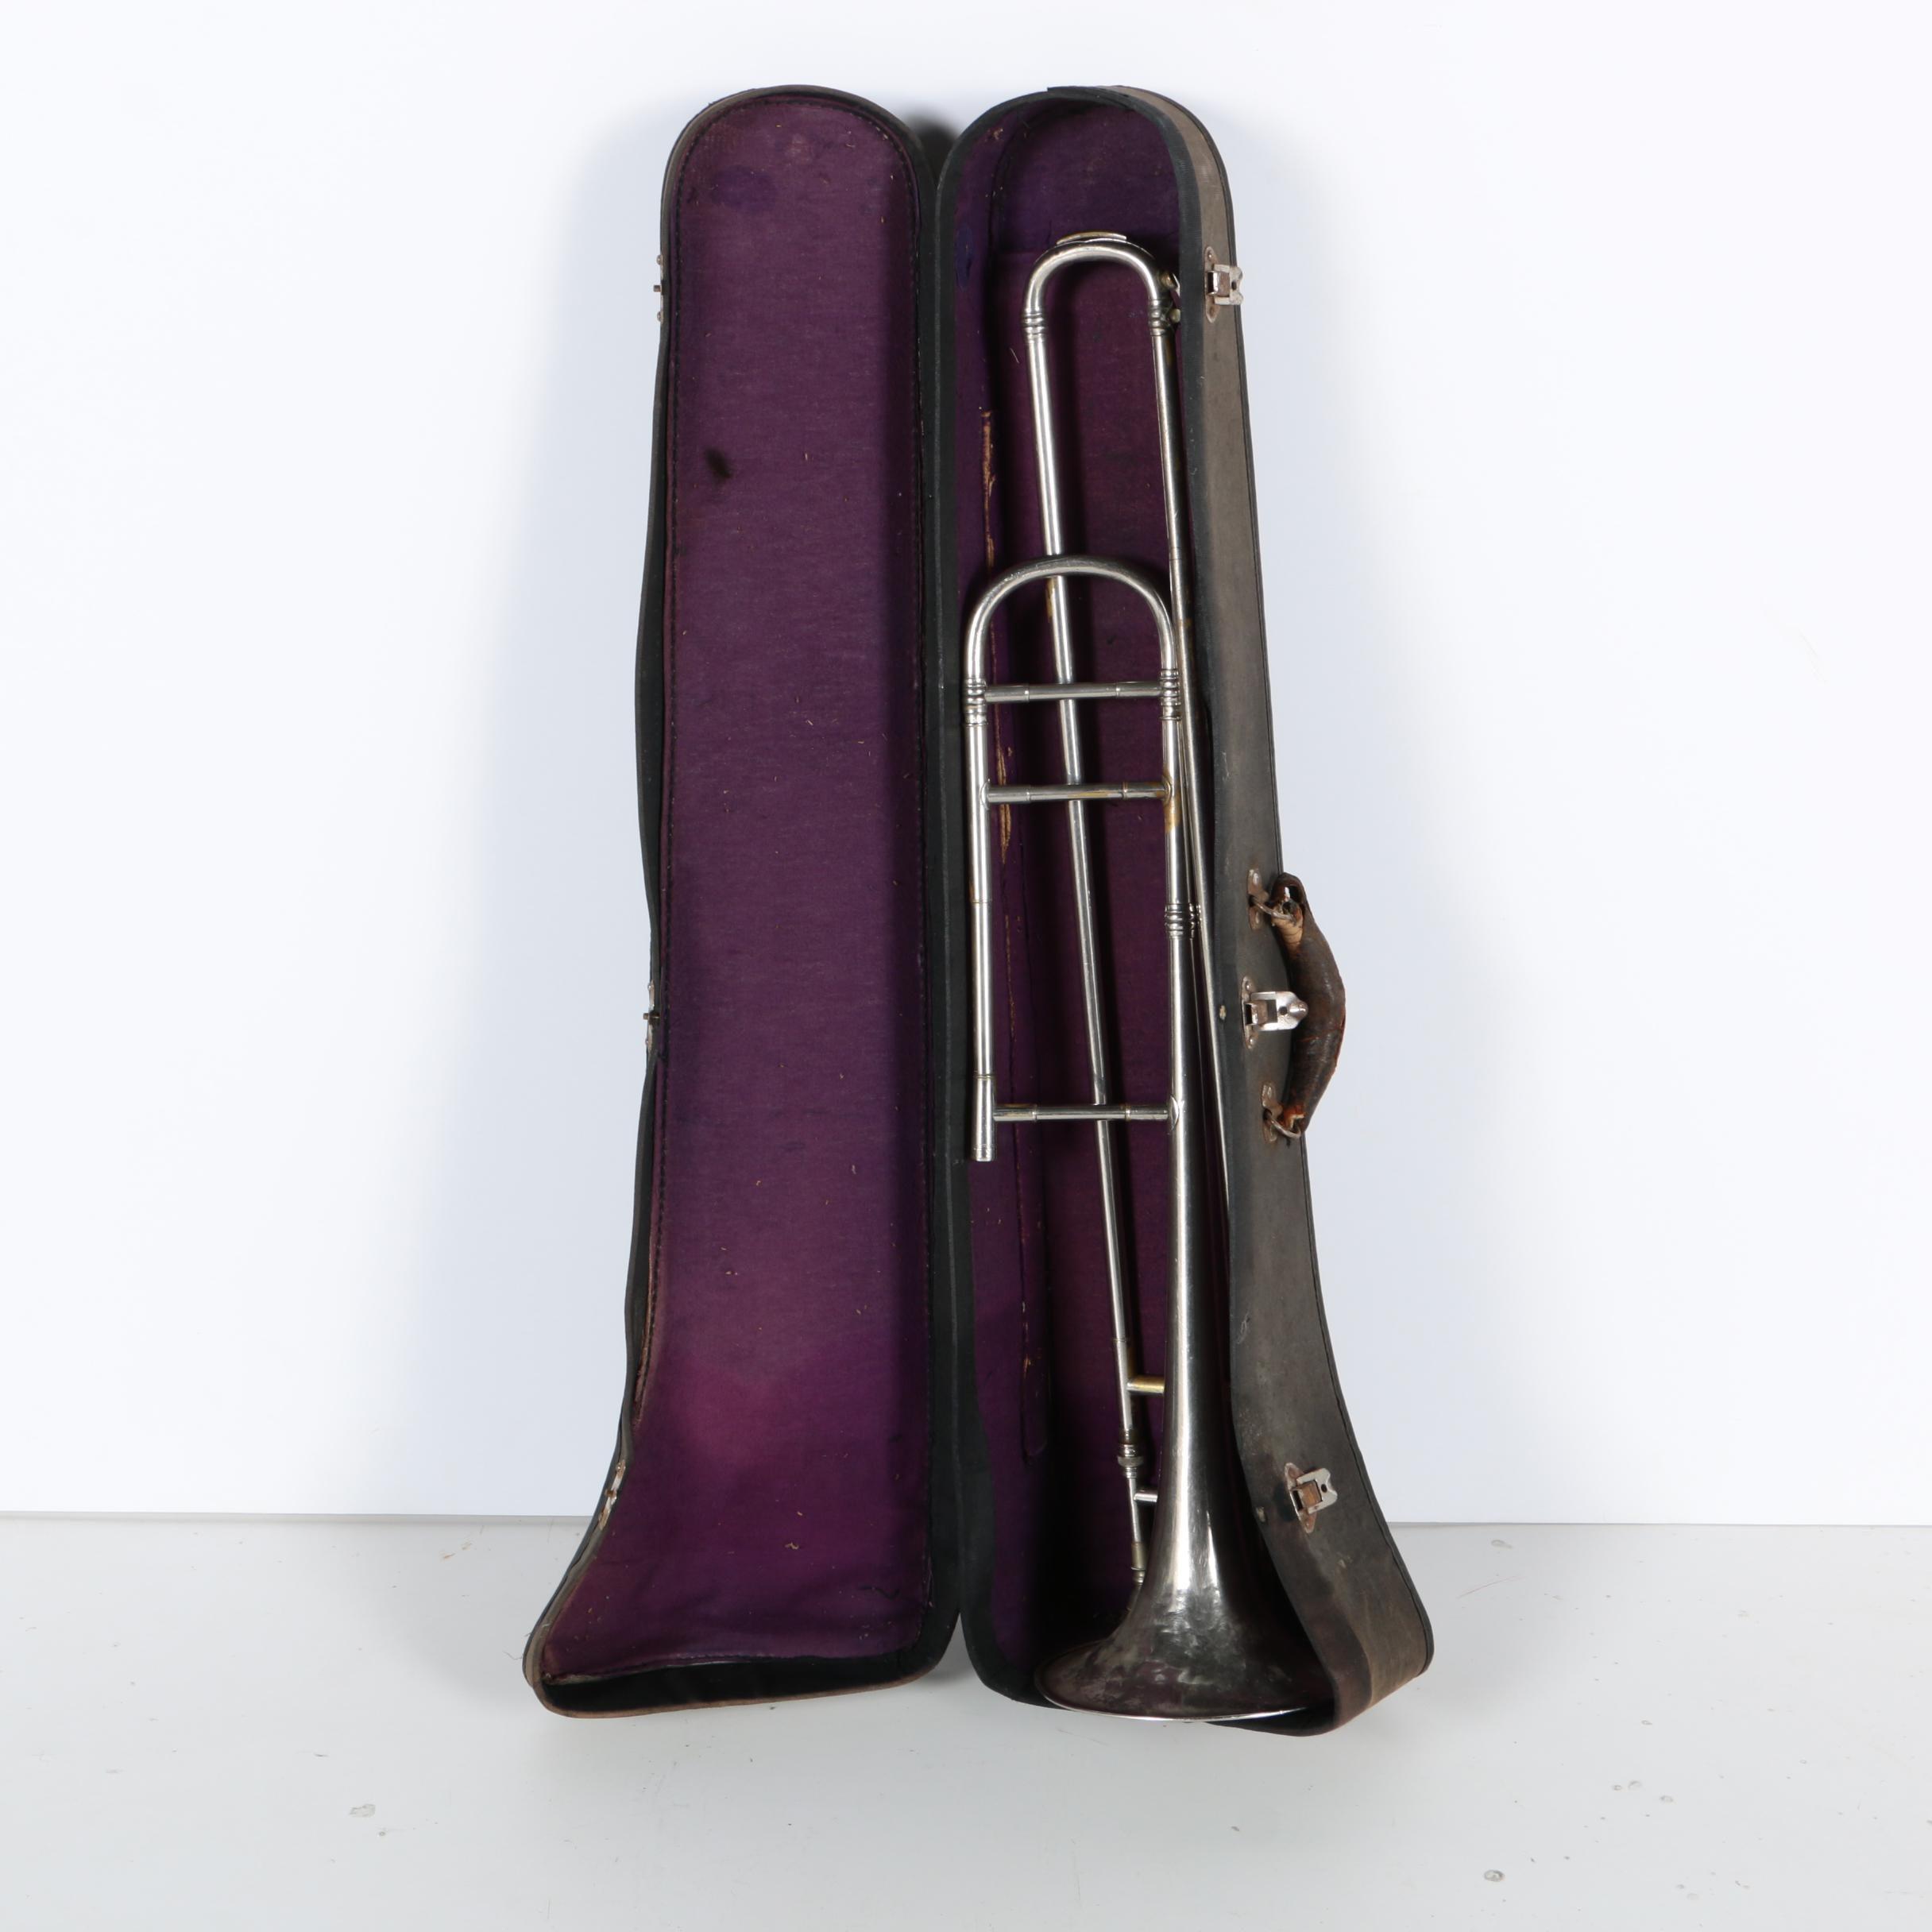 Vintage M. Dupont Trombone with Case